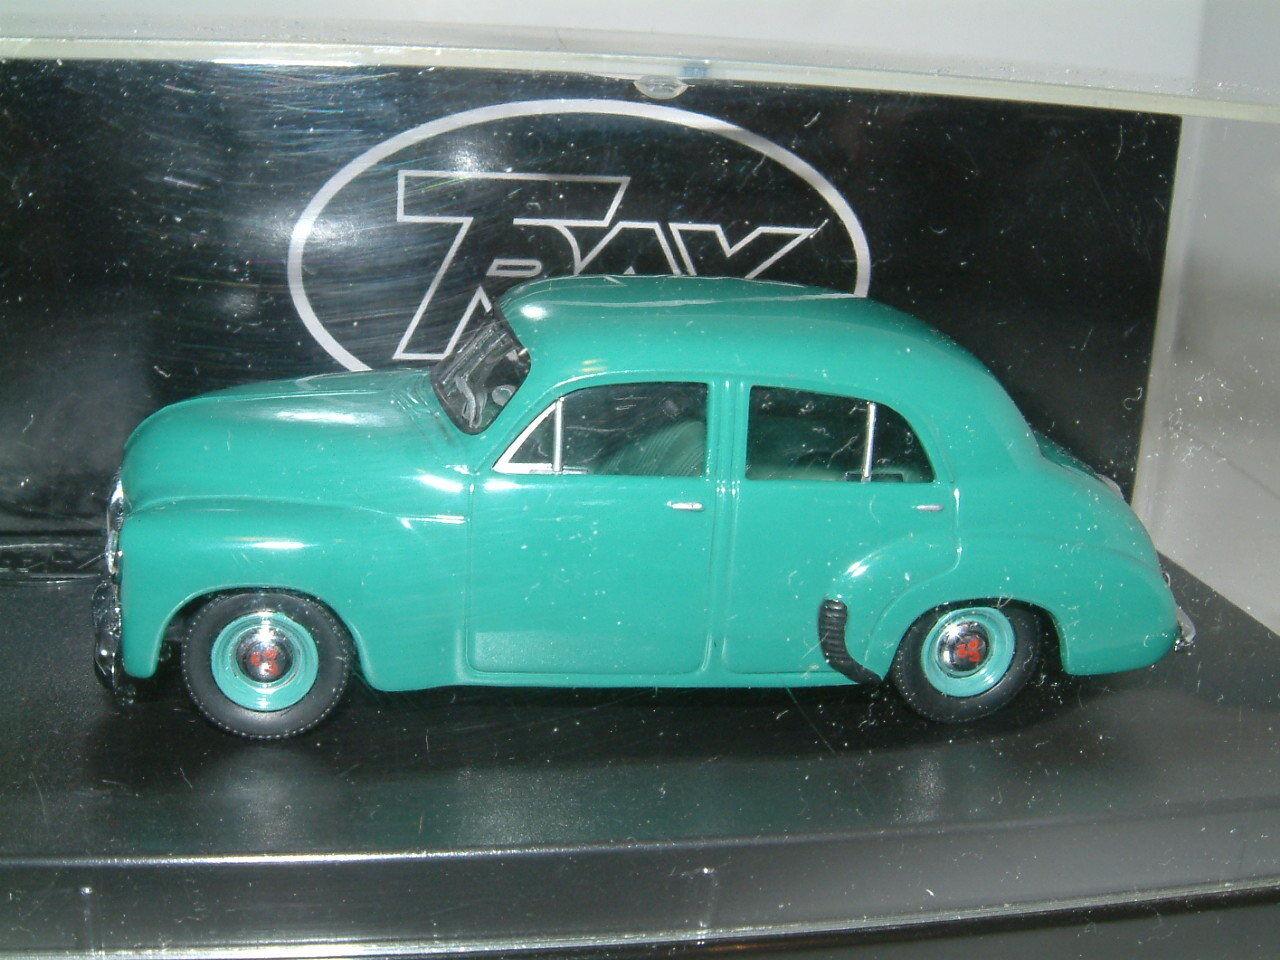 TRAX 1948 Holden 48 215 FX Berlina in verde, l'Australia TG